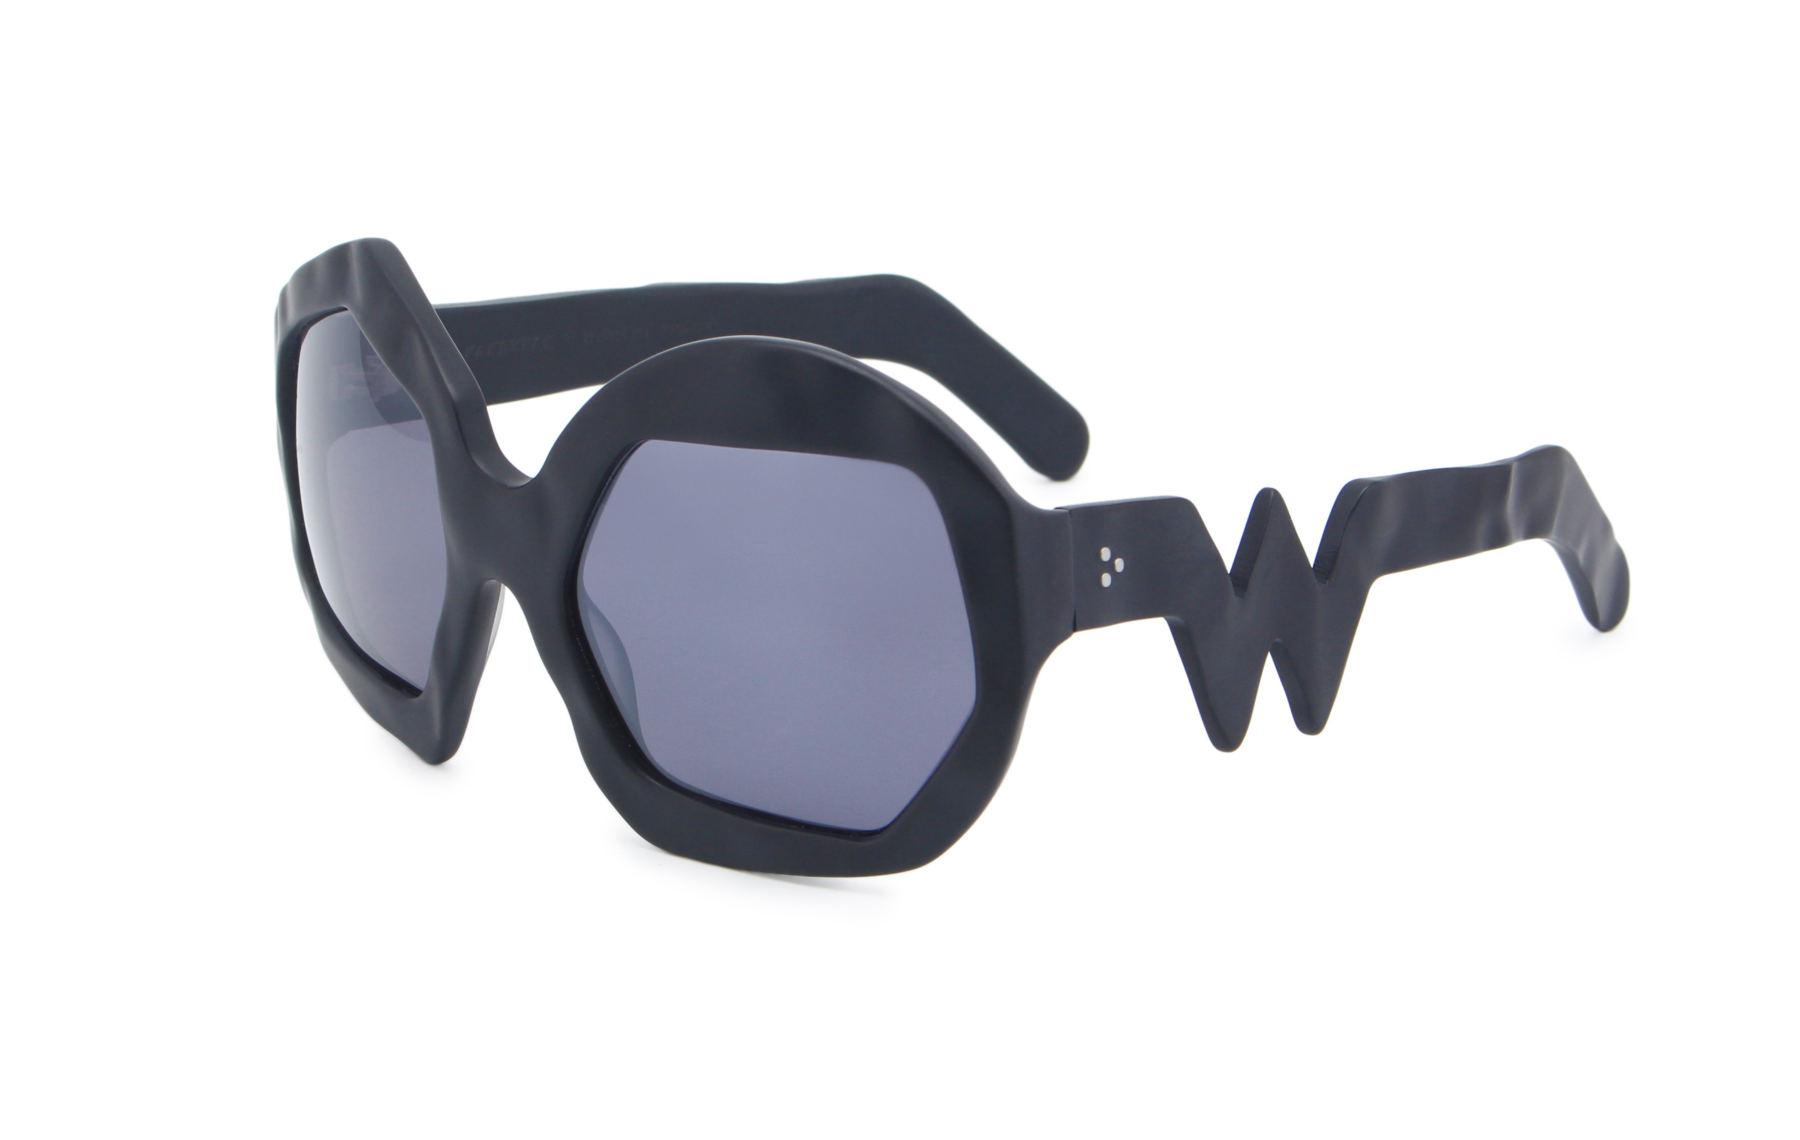 FAKBYFAK x Walter Van Beirendonck  Thunder Sunglasses. Black Code: FBF-09-12-01